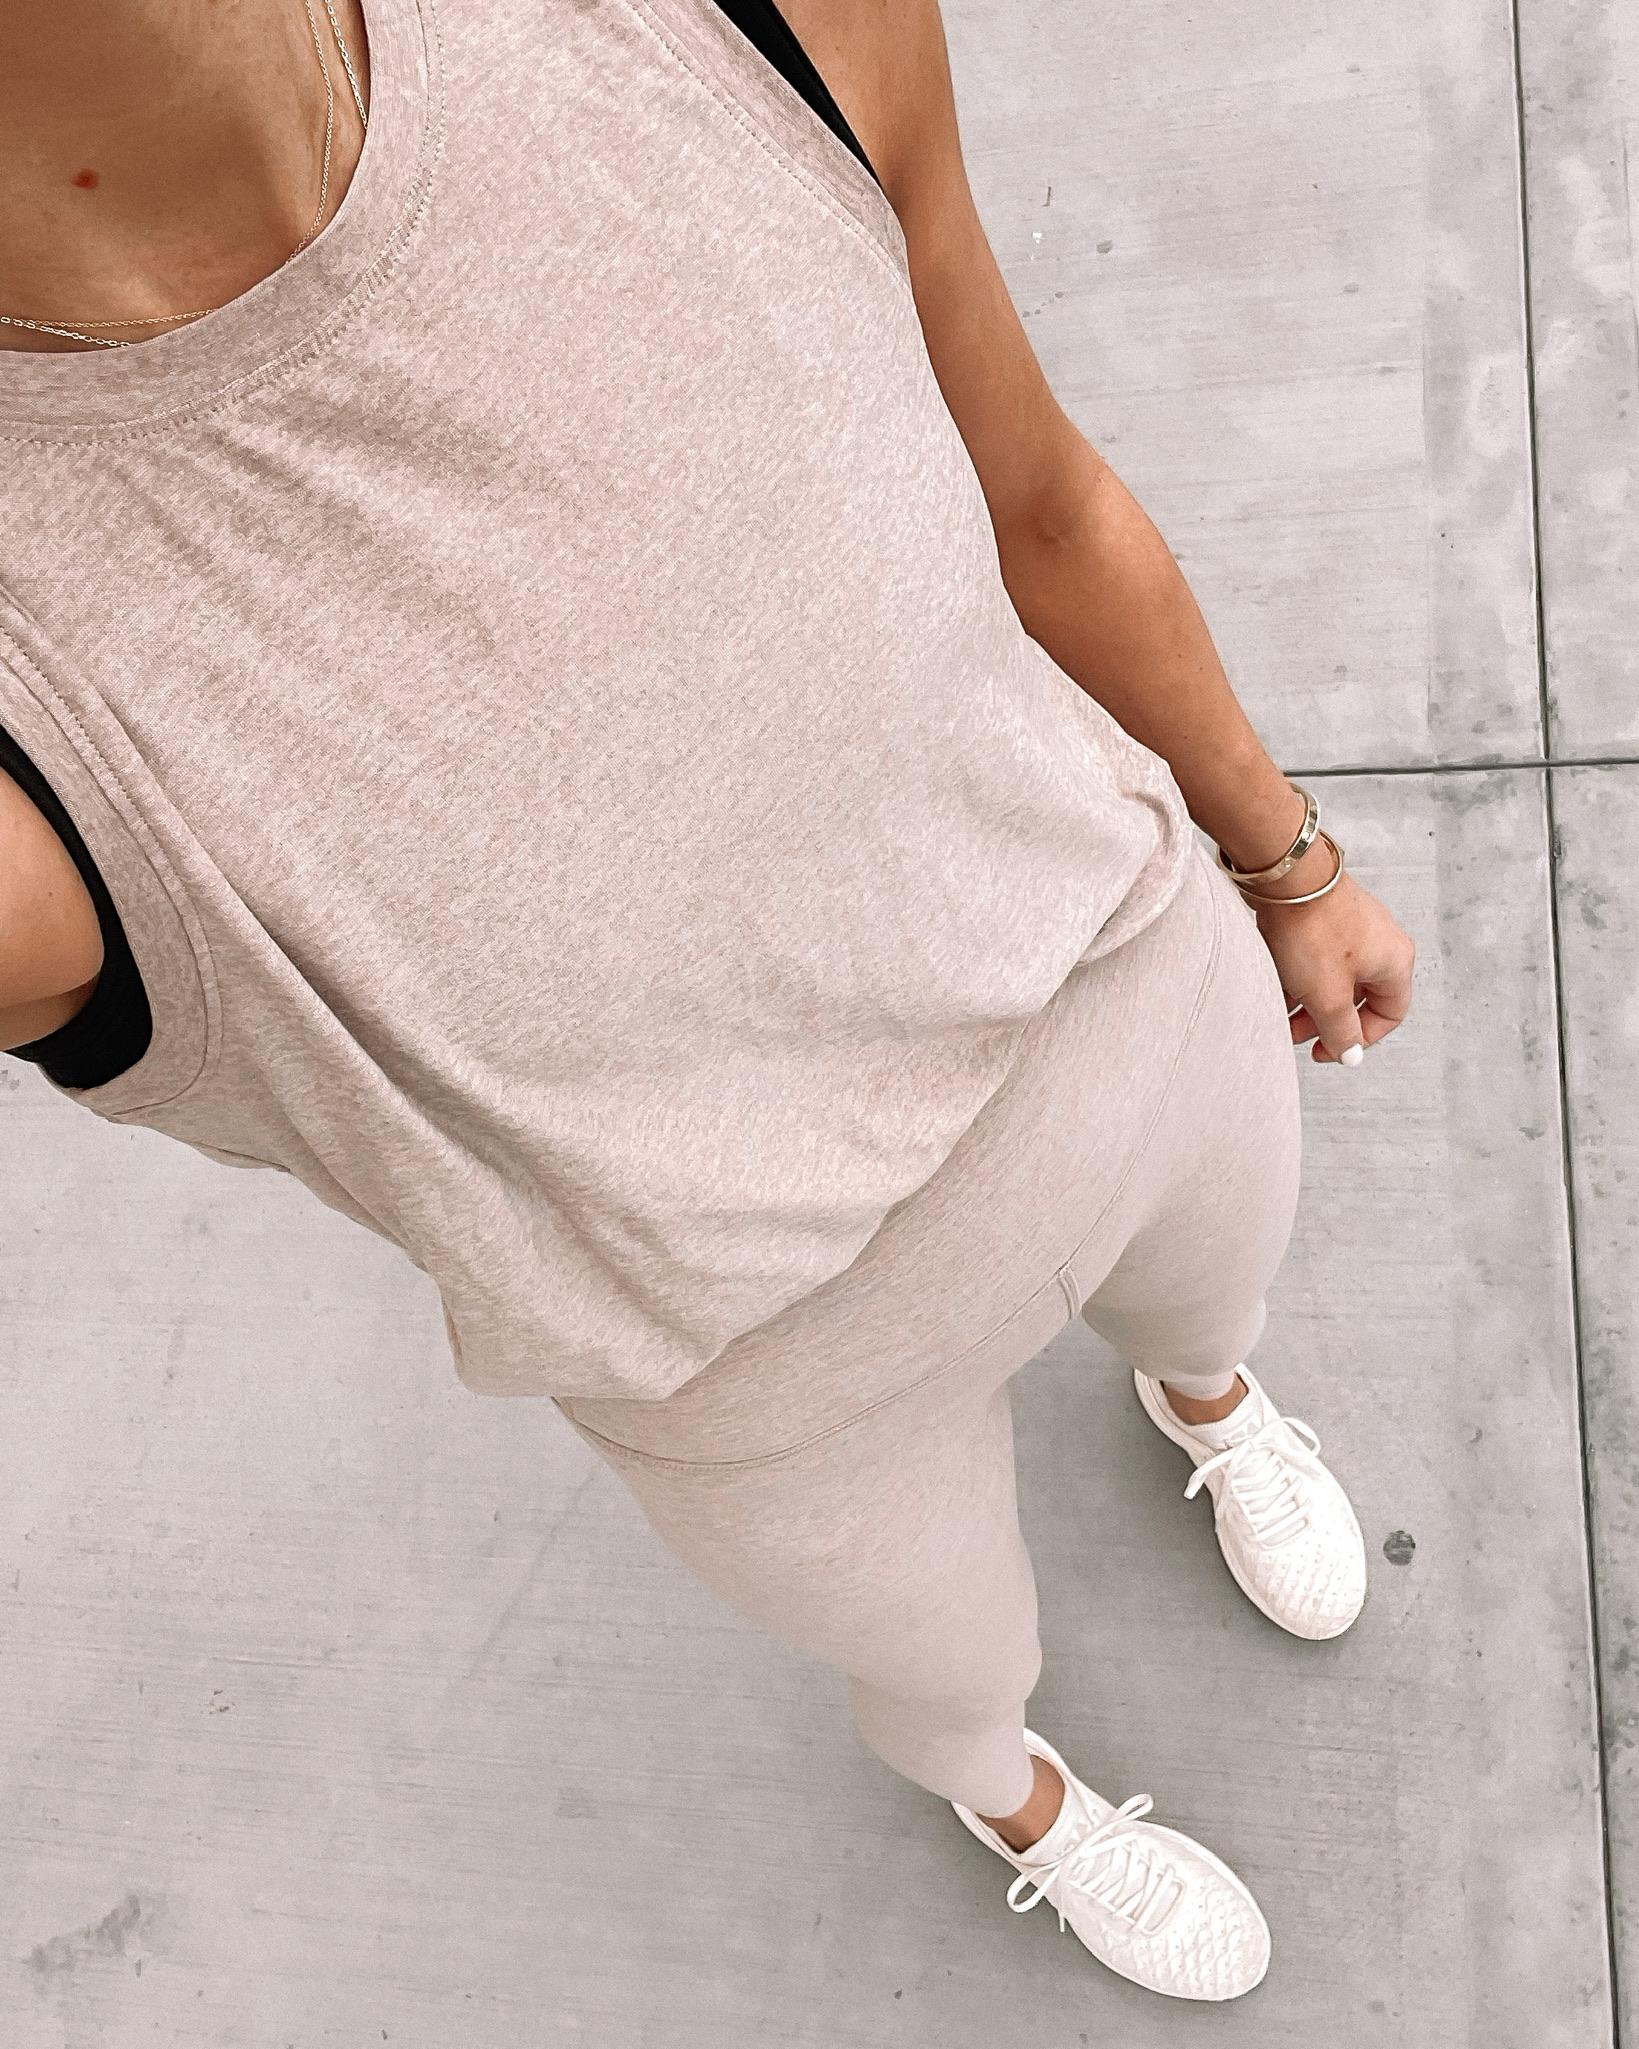 Fashion Jackson Wearing Beyond Yoga Beige Tank Beyond Yoga Beige Leggings APL Sneakers workout outfits for women